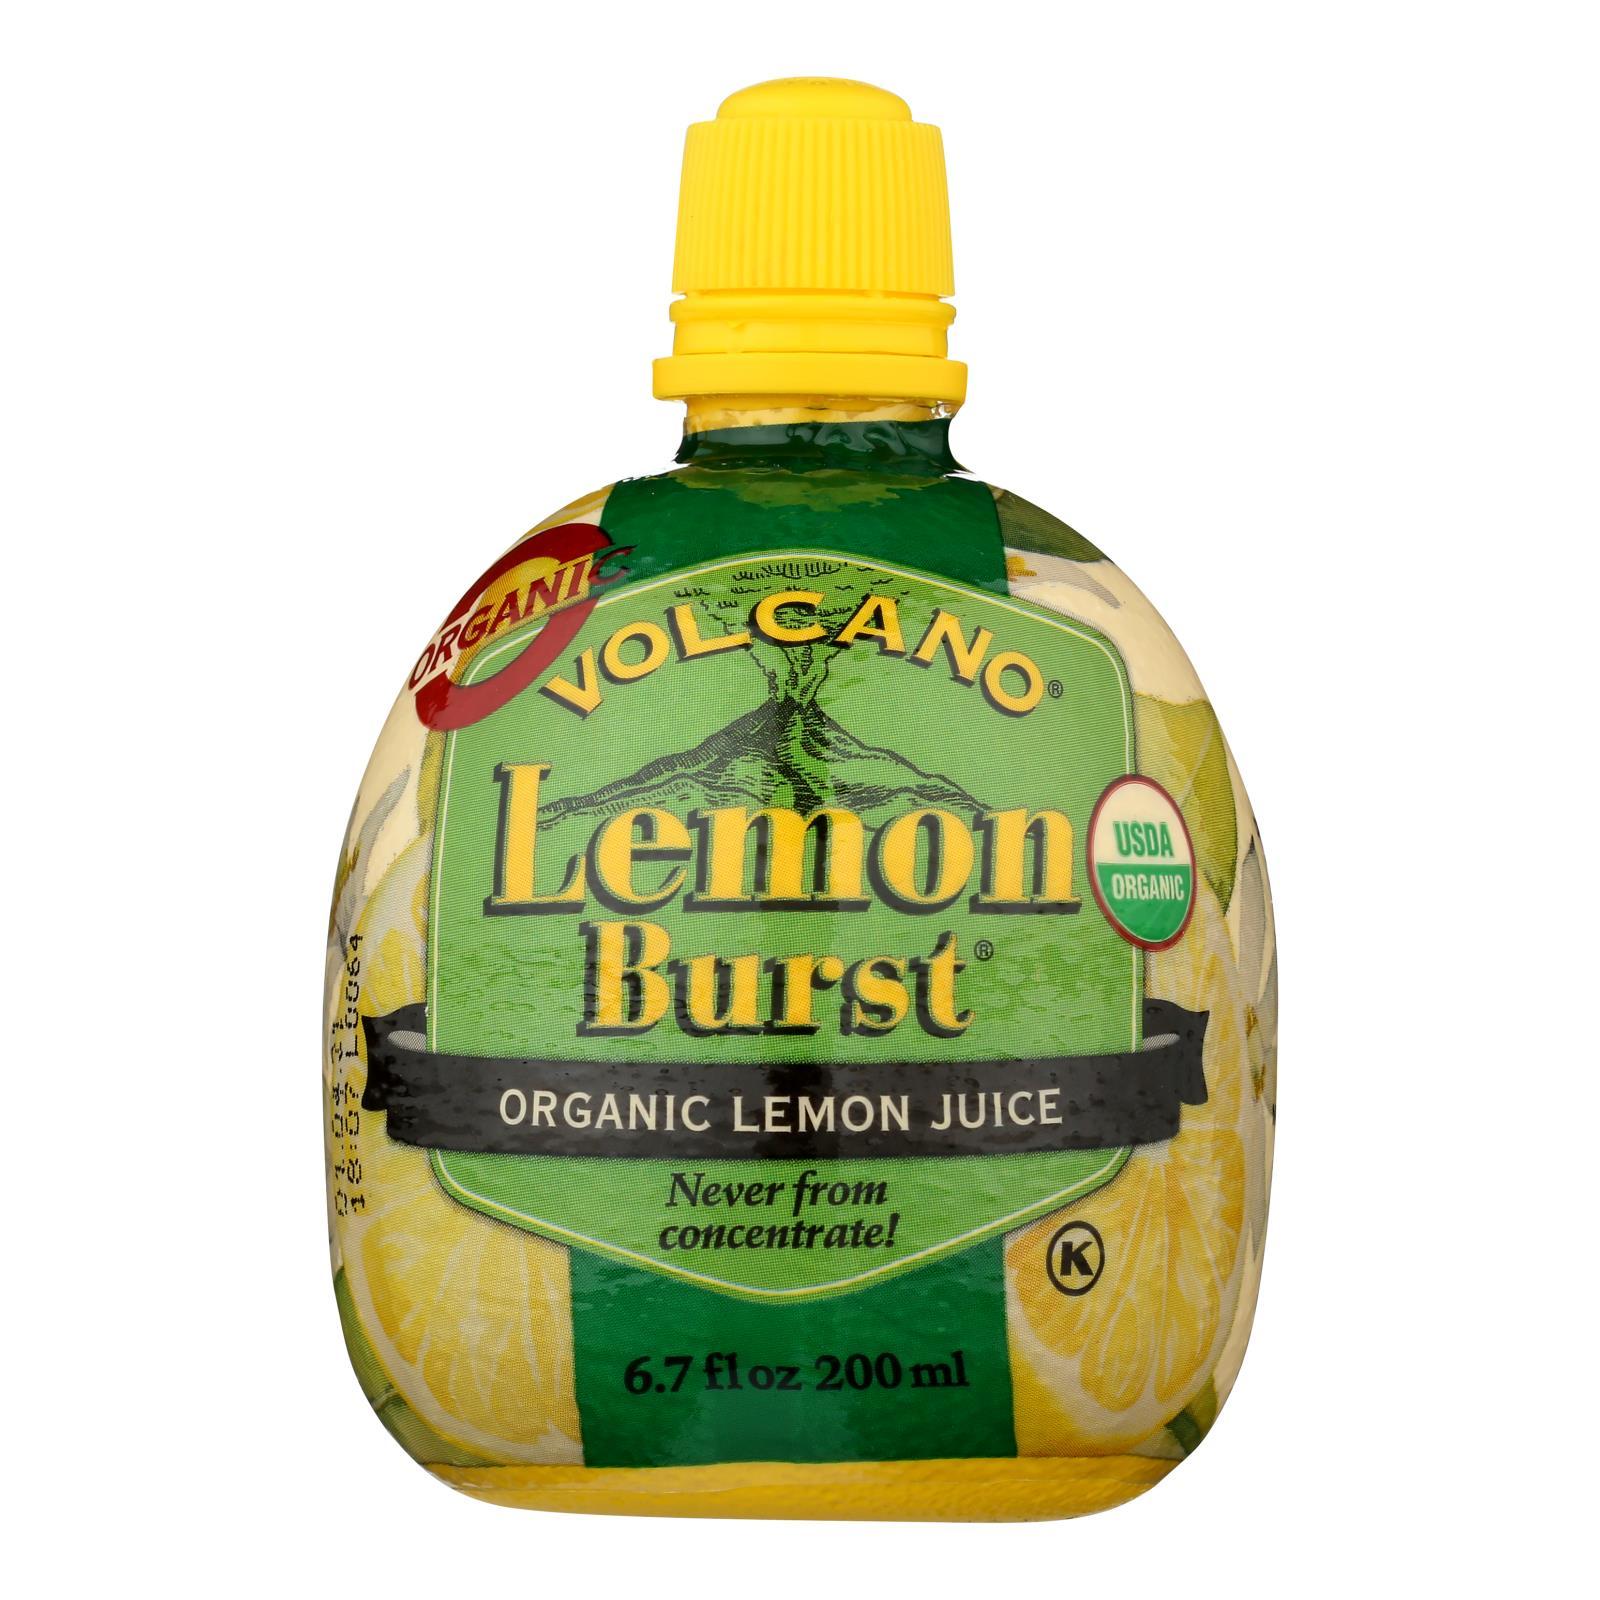 Volcano Lemon Burst Juice  - Case of 12 - 6.7 OZ